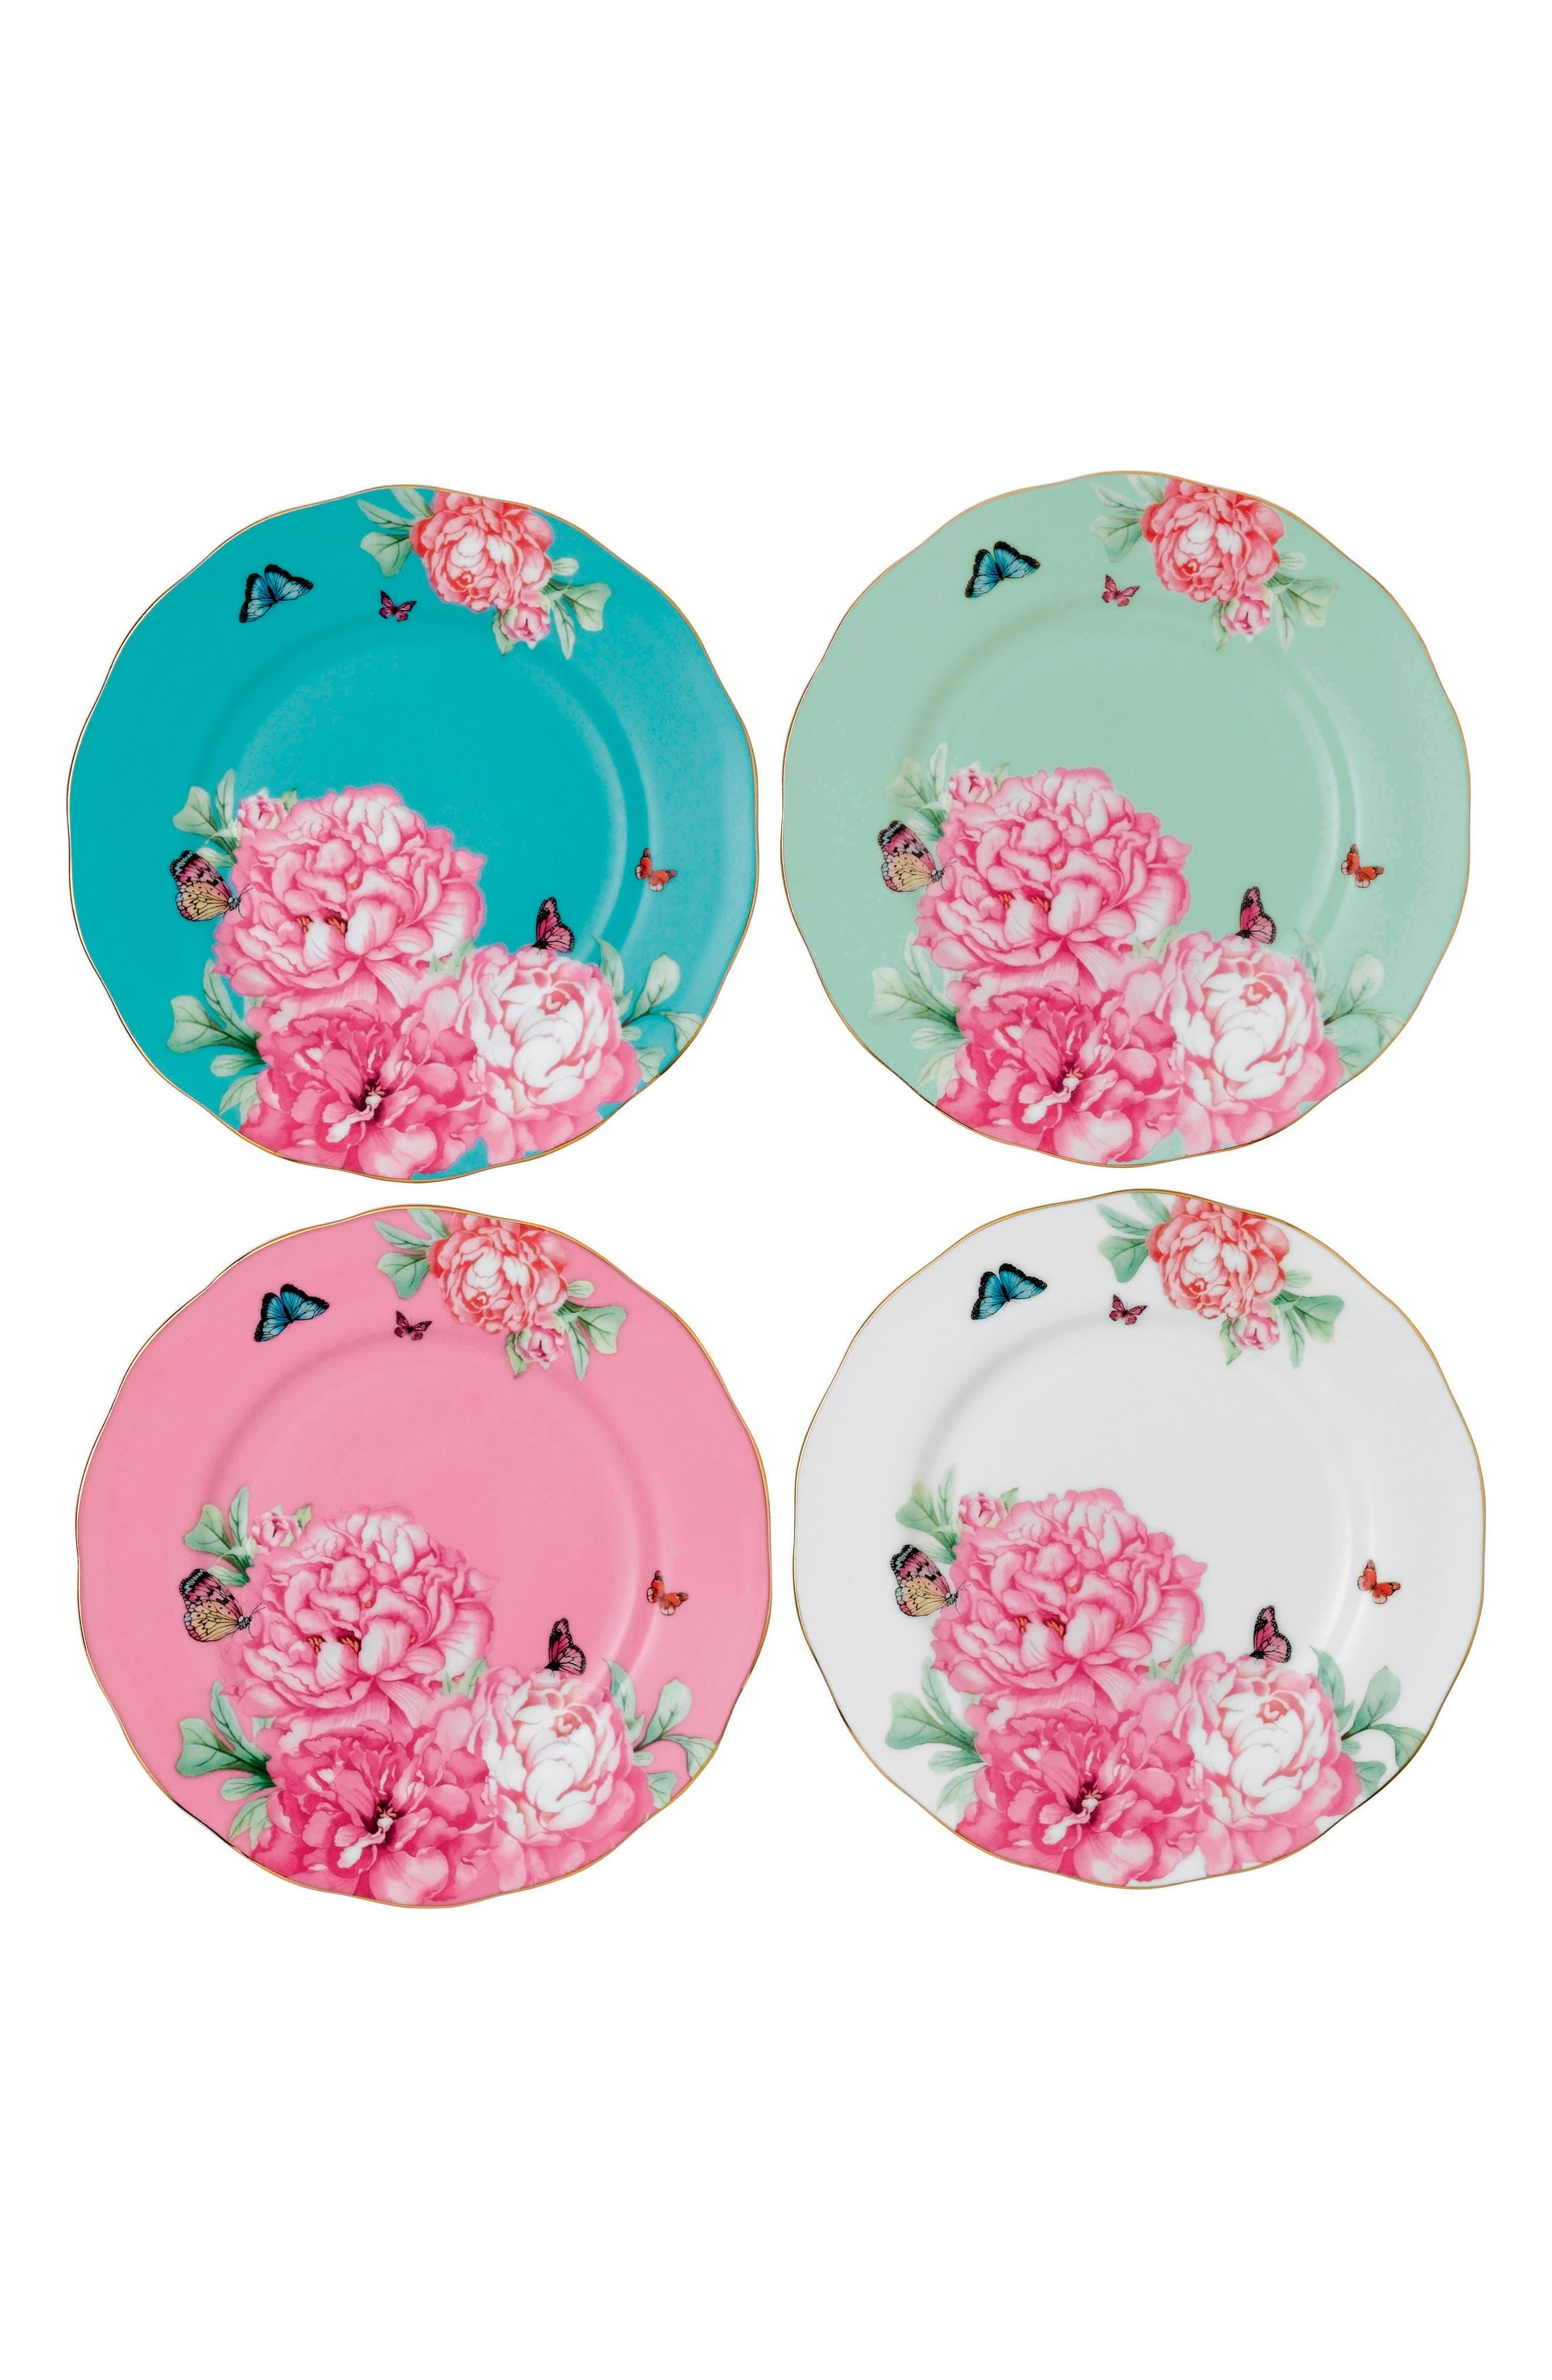 Miranda Kerr for Royal Albert Friendship Set of 4 Accent Plates